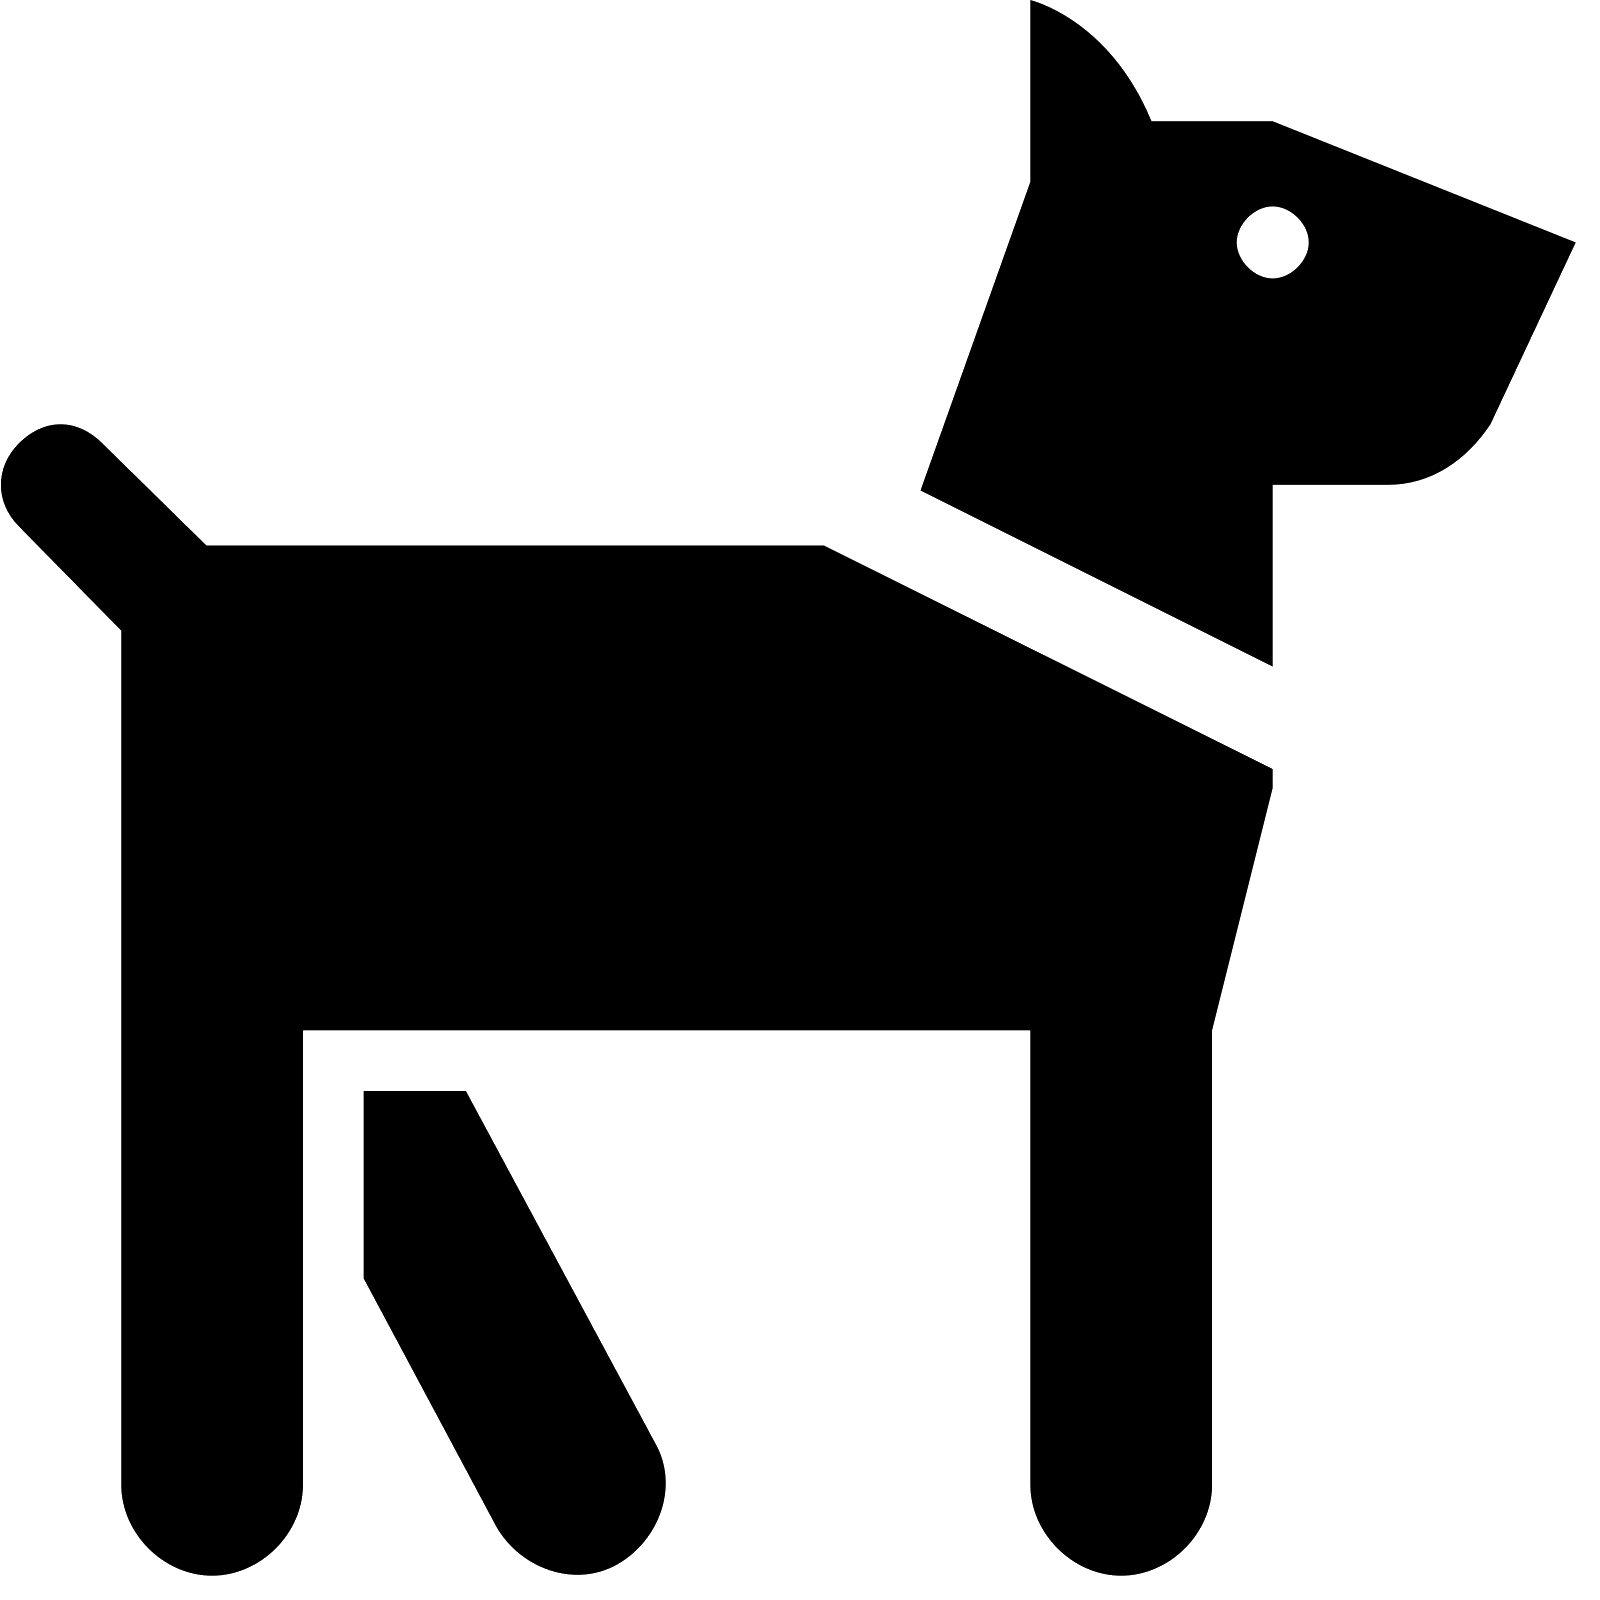 Dog vector icon.